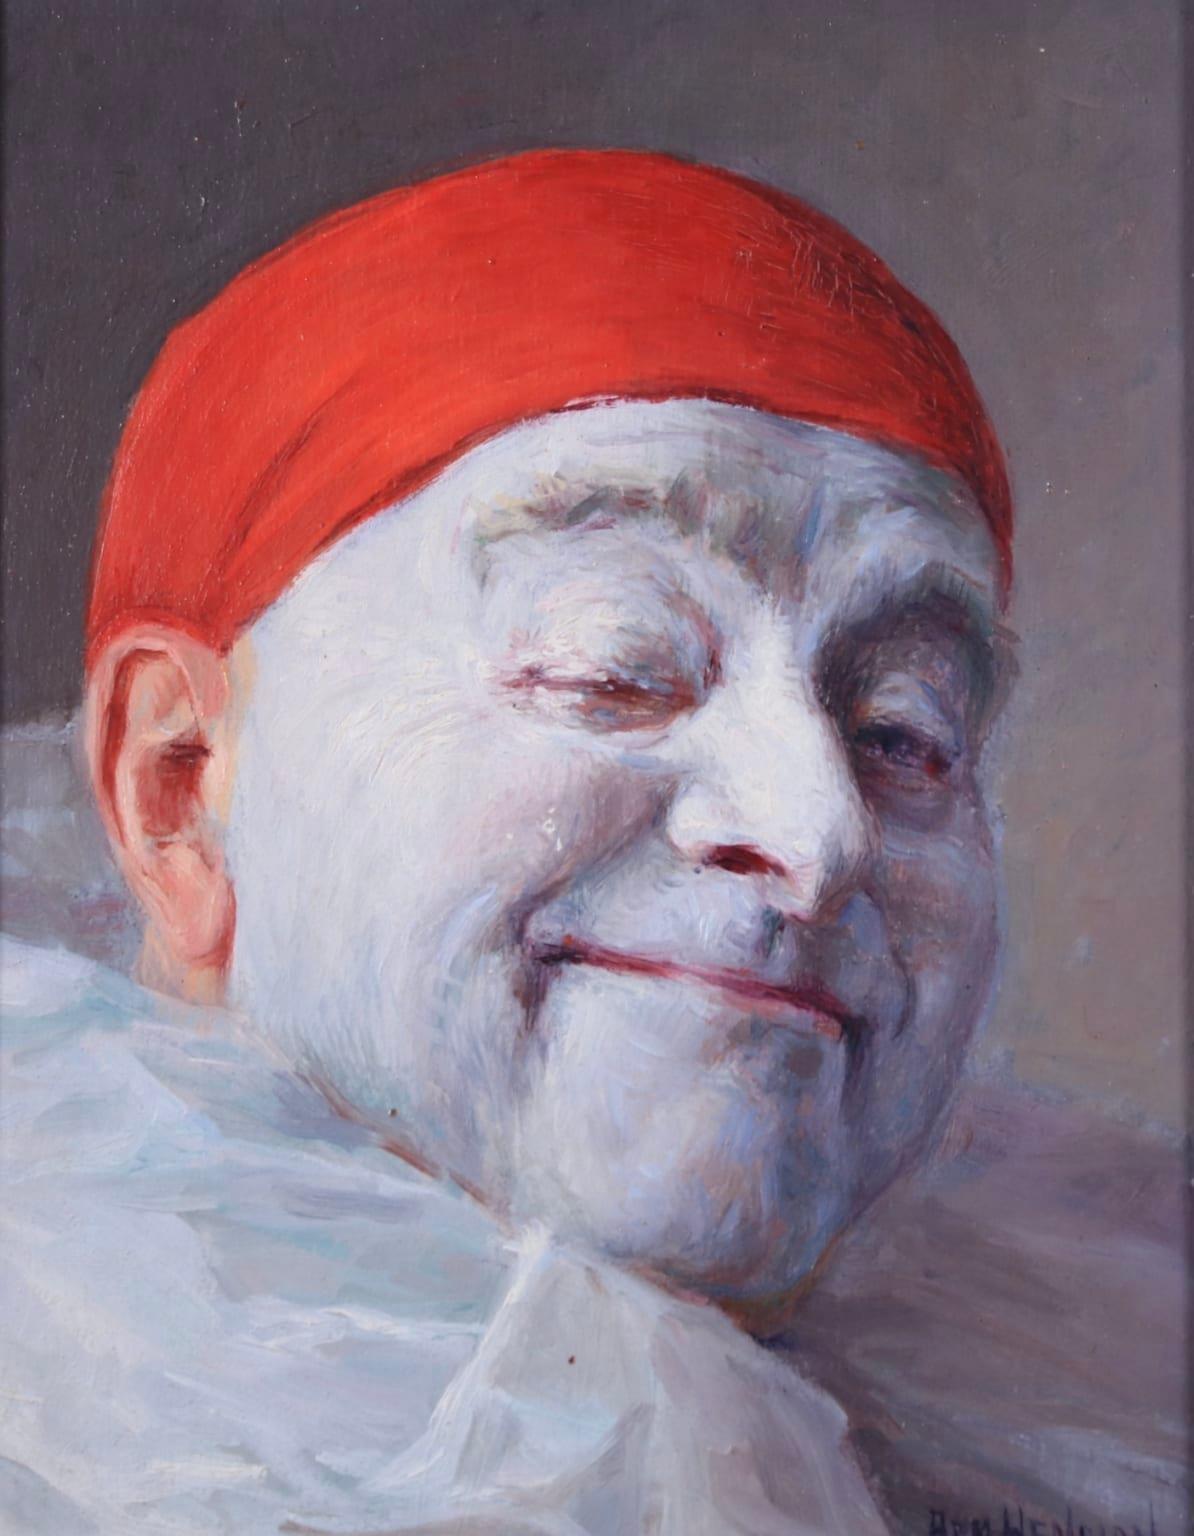 Pierrot - Impressionist Oil, Portrait of a Clown by Armand Francois Henrion